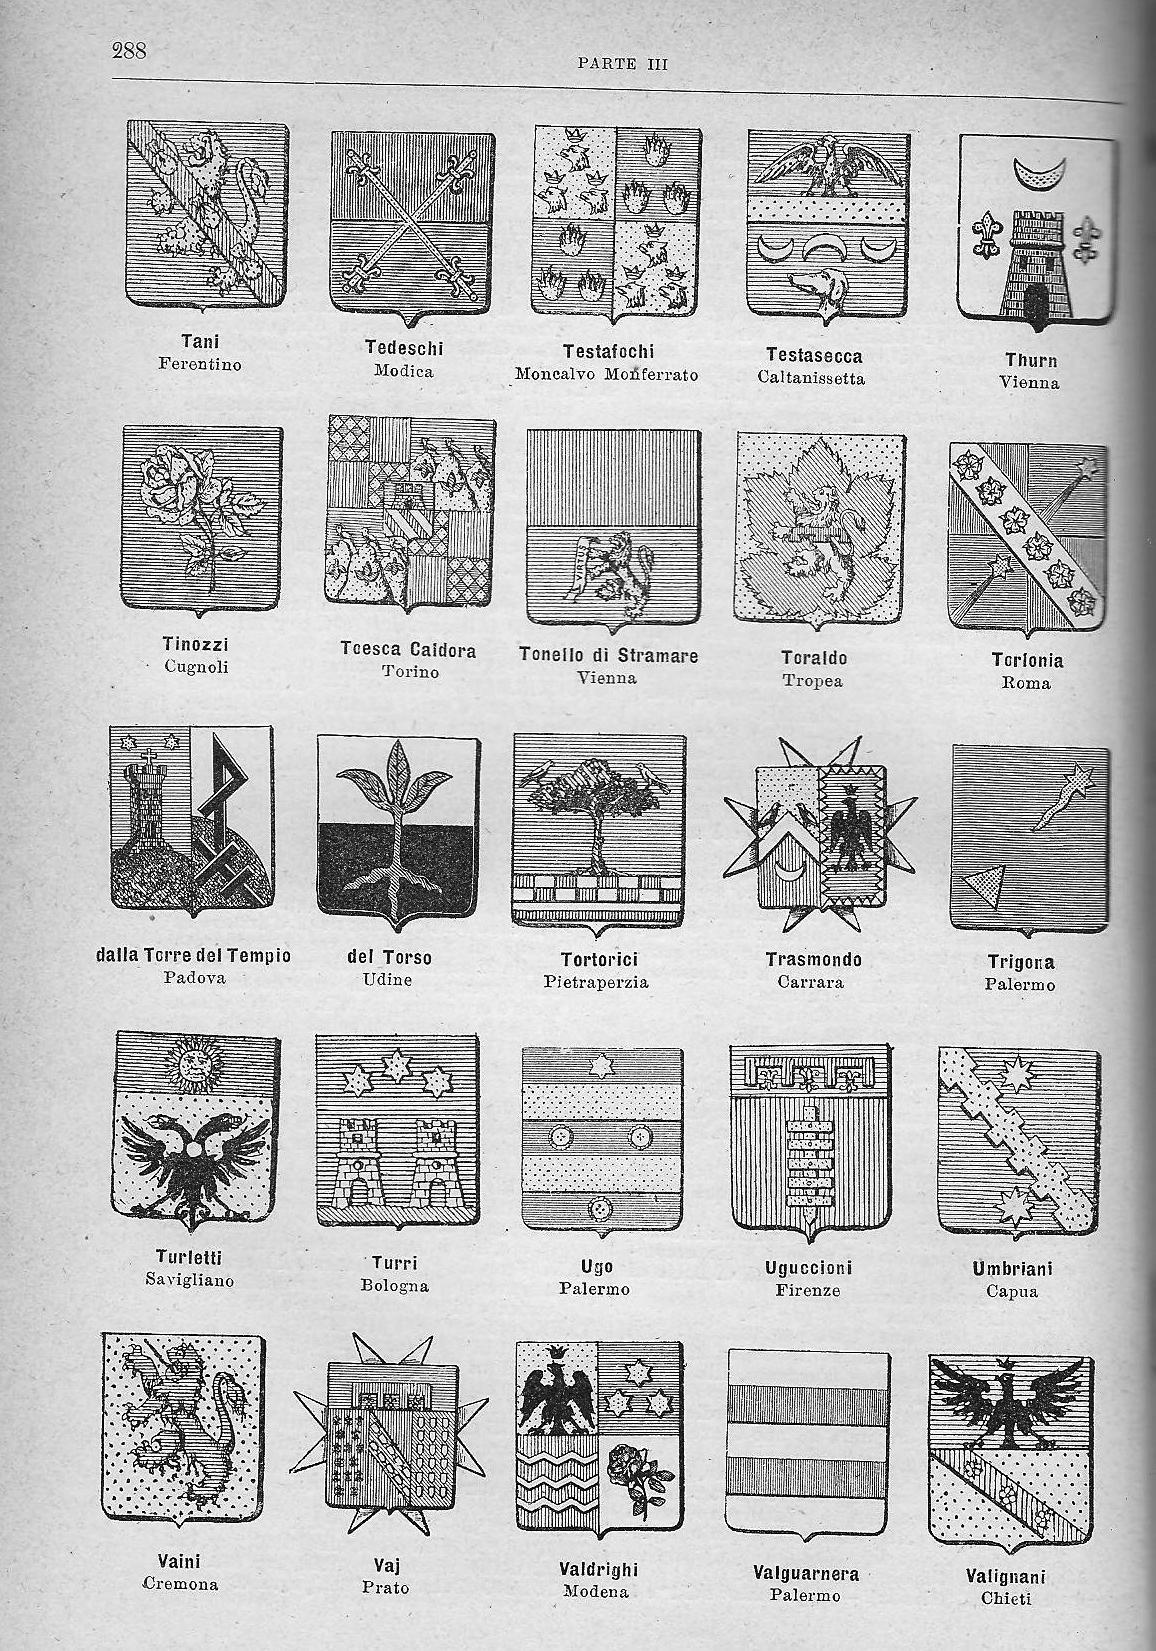 Calendario 1900.File Calendario D Oro 1900 Pagina 288 Jpg Wikimedia Commons